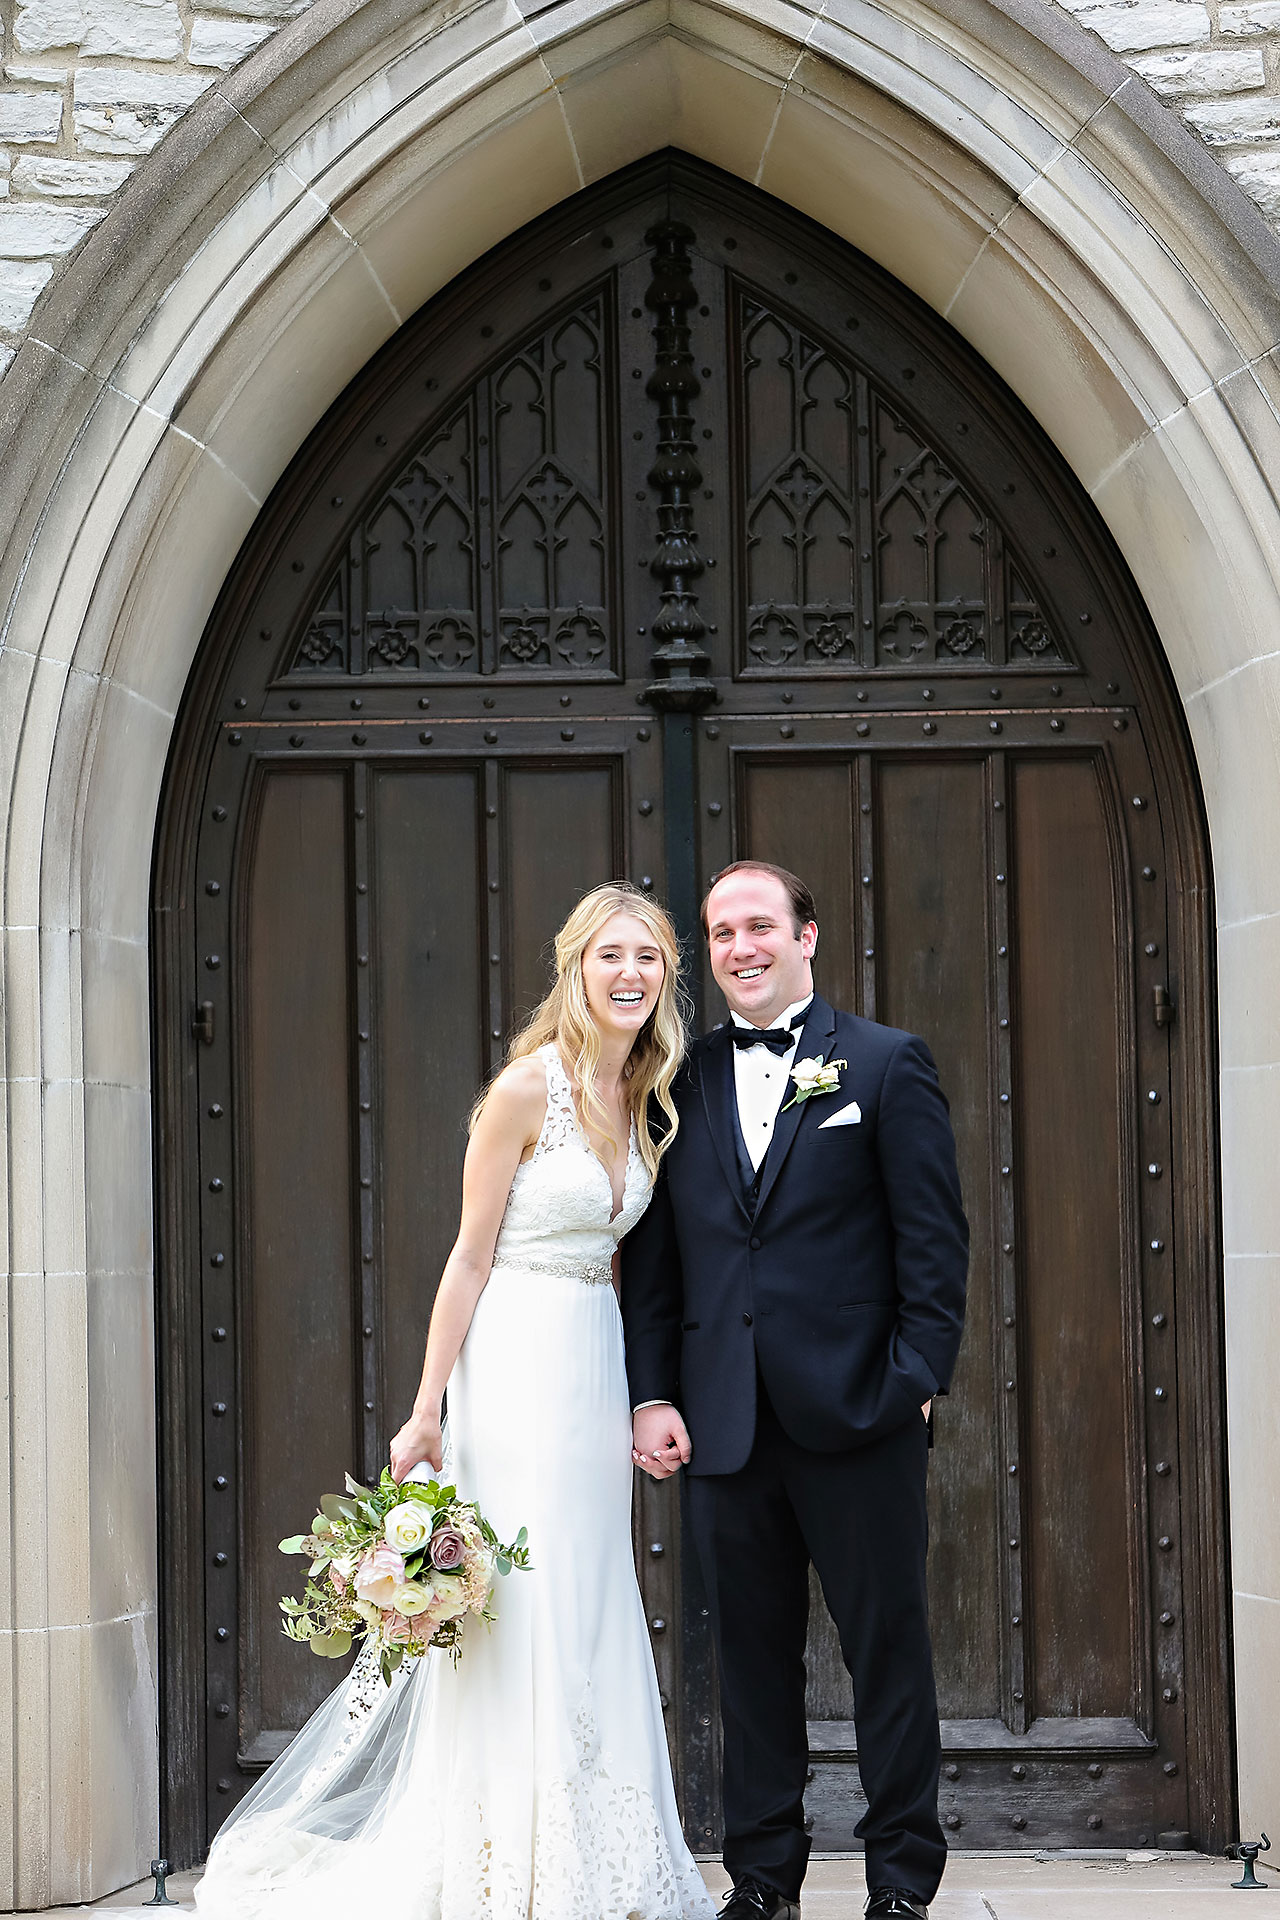 Allison Jeff Union Station Crowne Plaza Indianapolis wedding 252